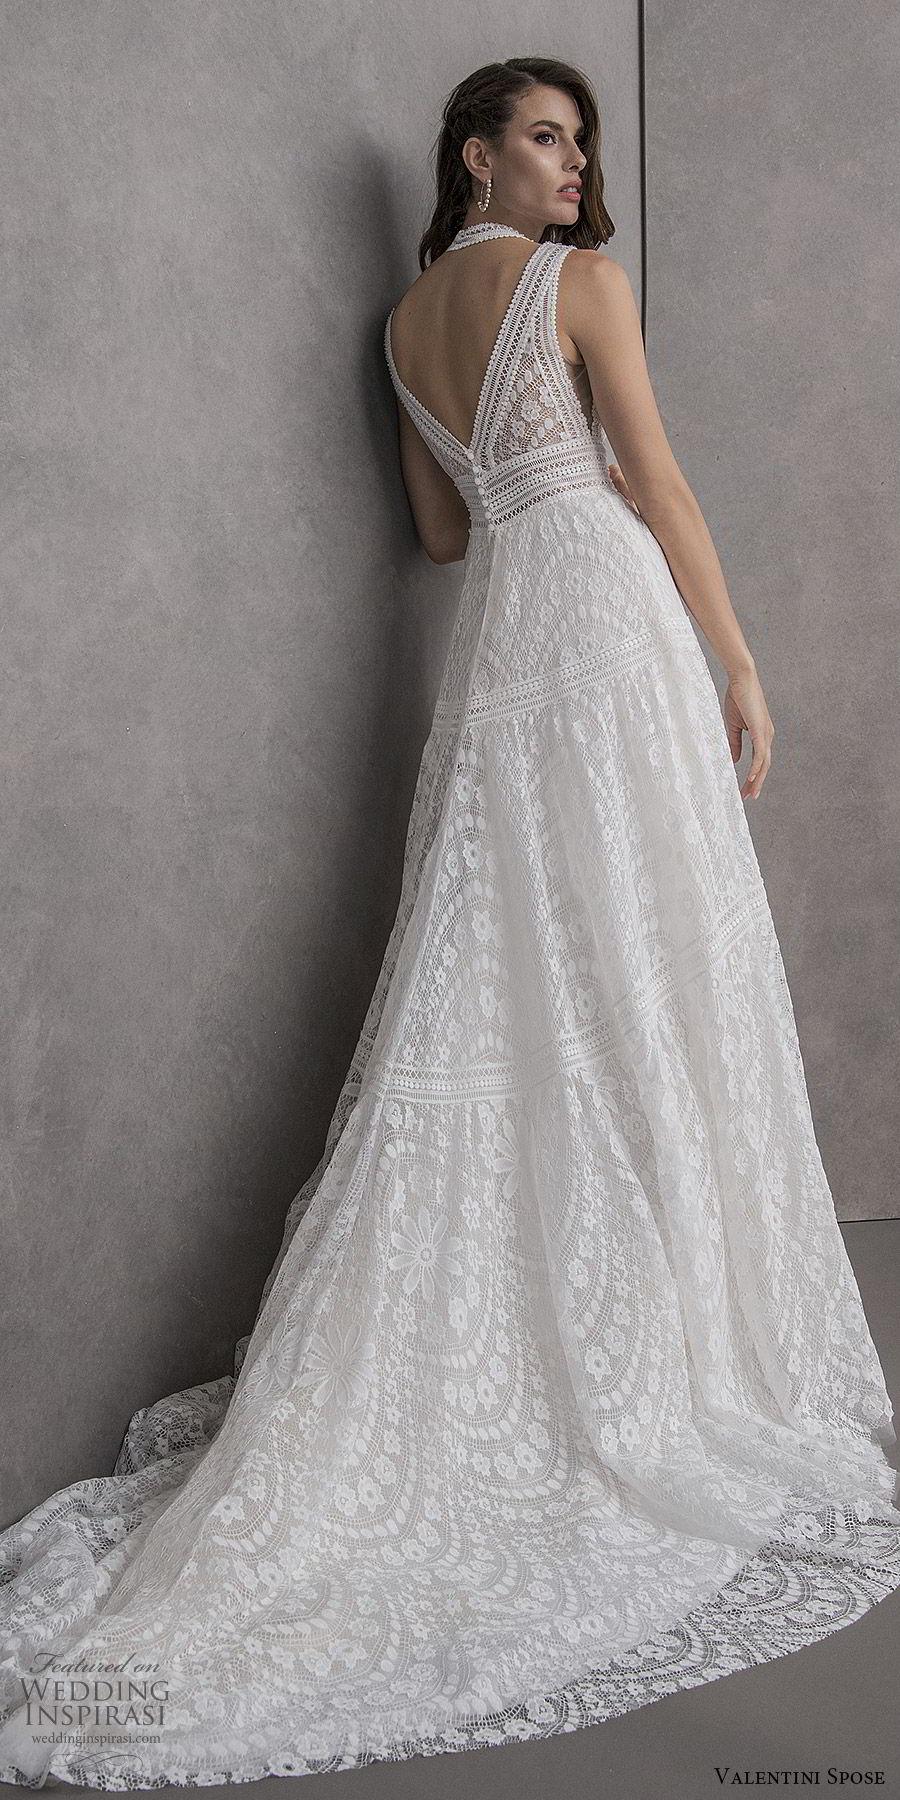 valentini spose spring 2020 bridal sleeveless halter neckline deep v neck fully embellished lace a line wedding dress (12) romantic boho chic chapel train keyhole back bv